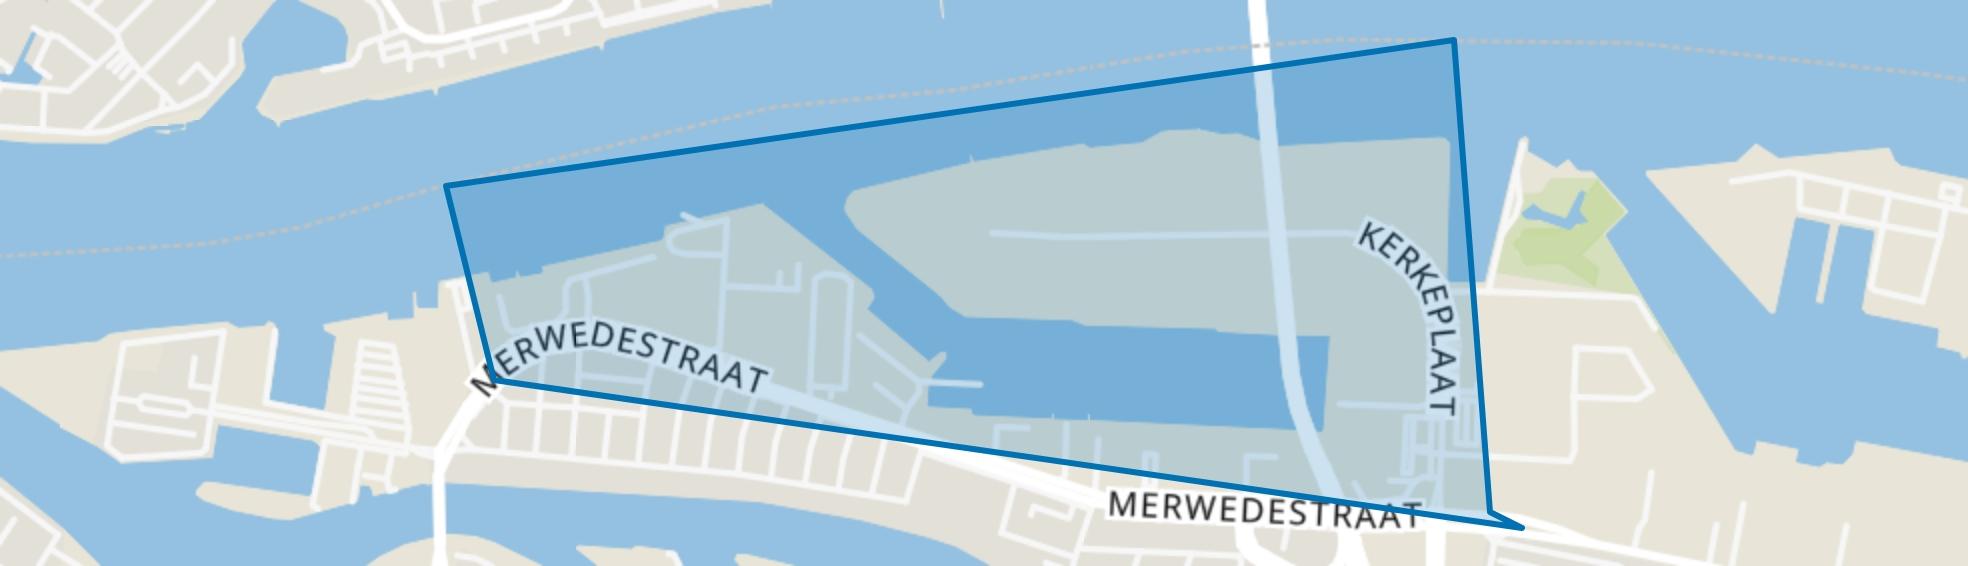 1e Merwedehaven en omgeving, Dordrecht map